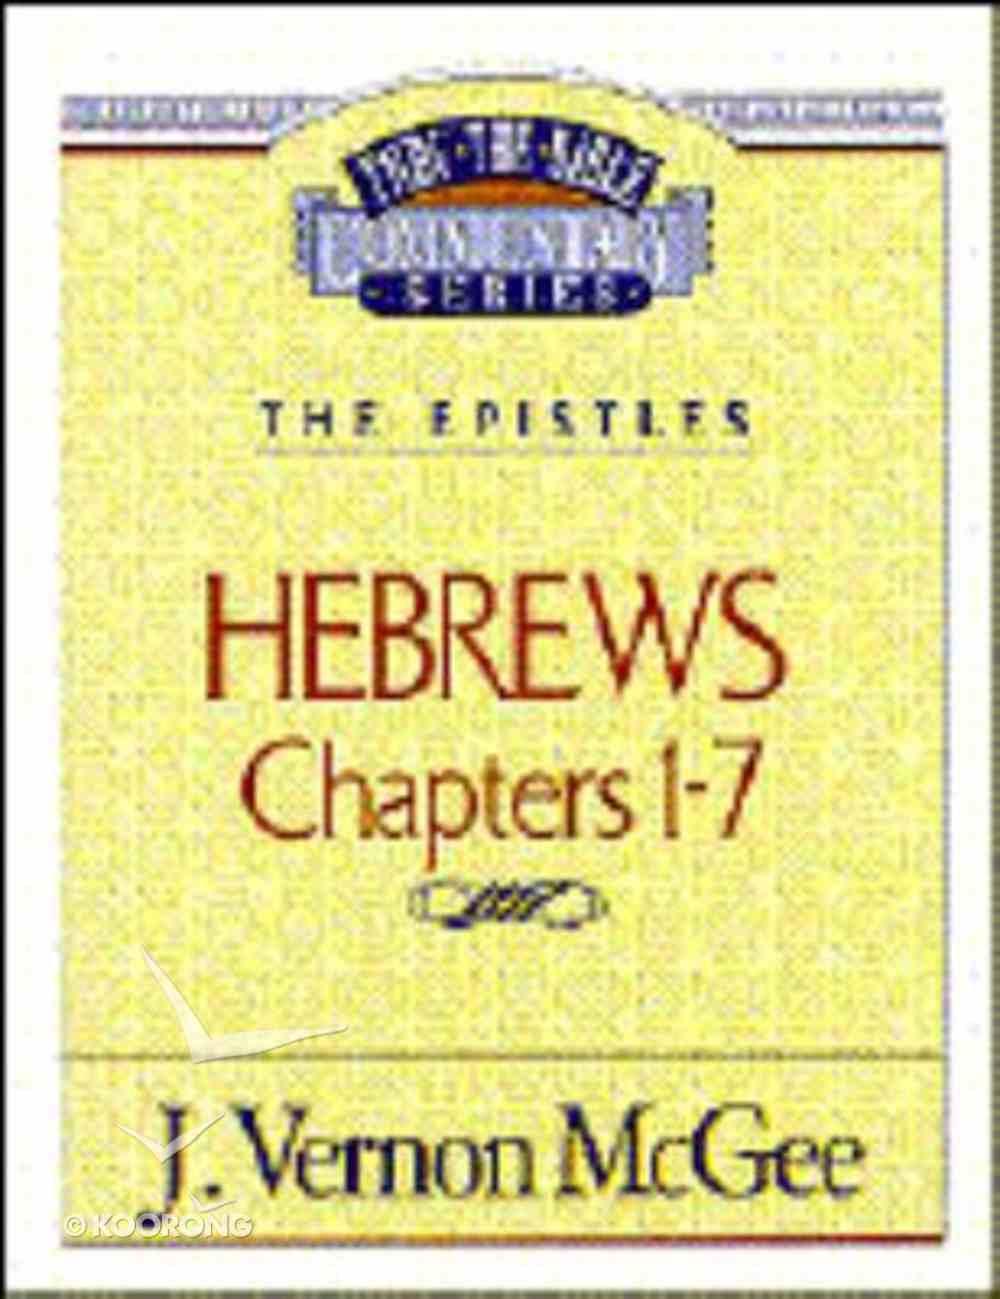 Thru the Bible NT #51: The Epistles (Hebrews 1-7) (#51 in Thru The Bible New Testament Series) Paperback